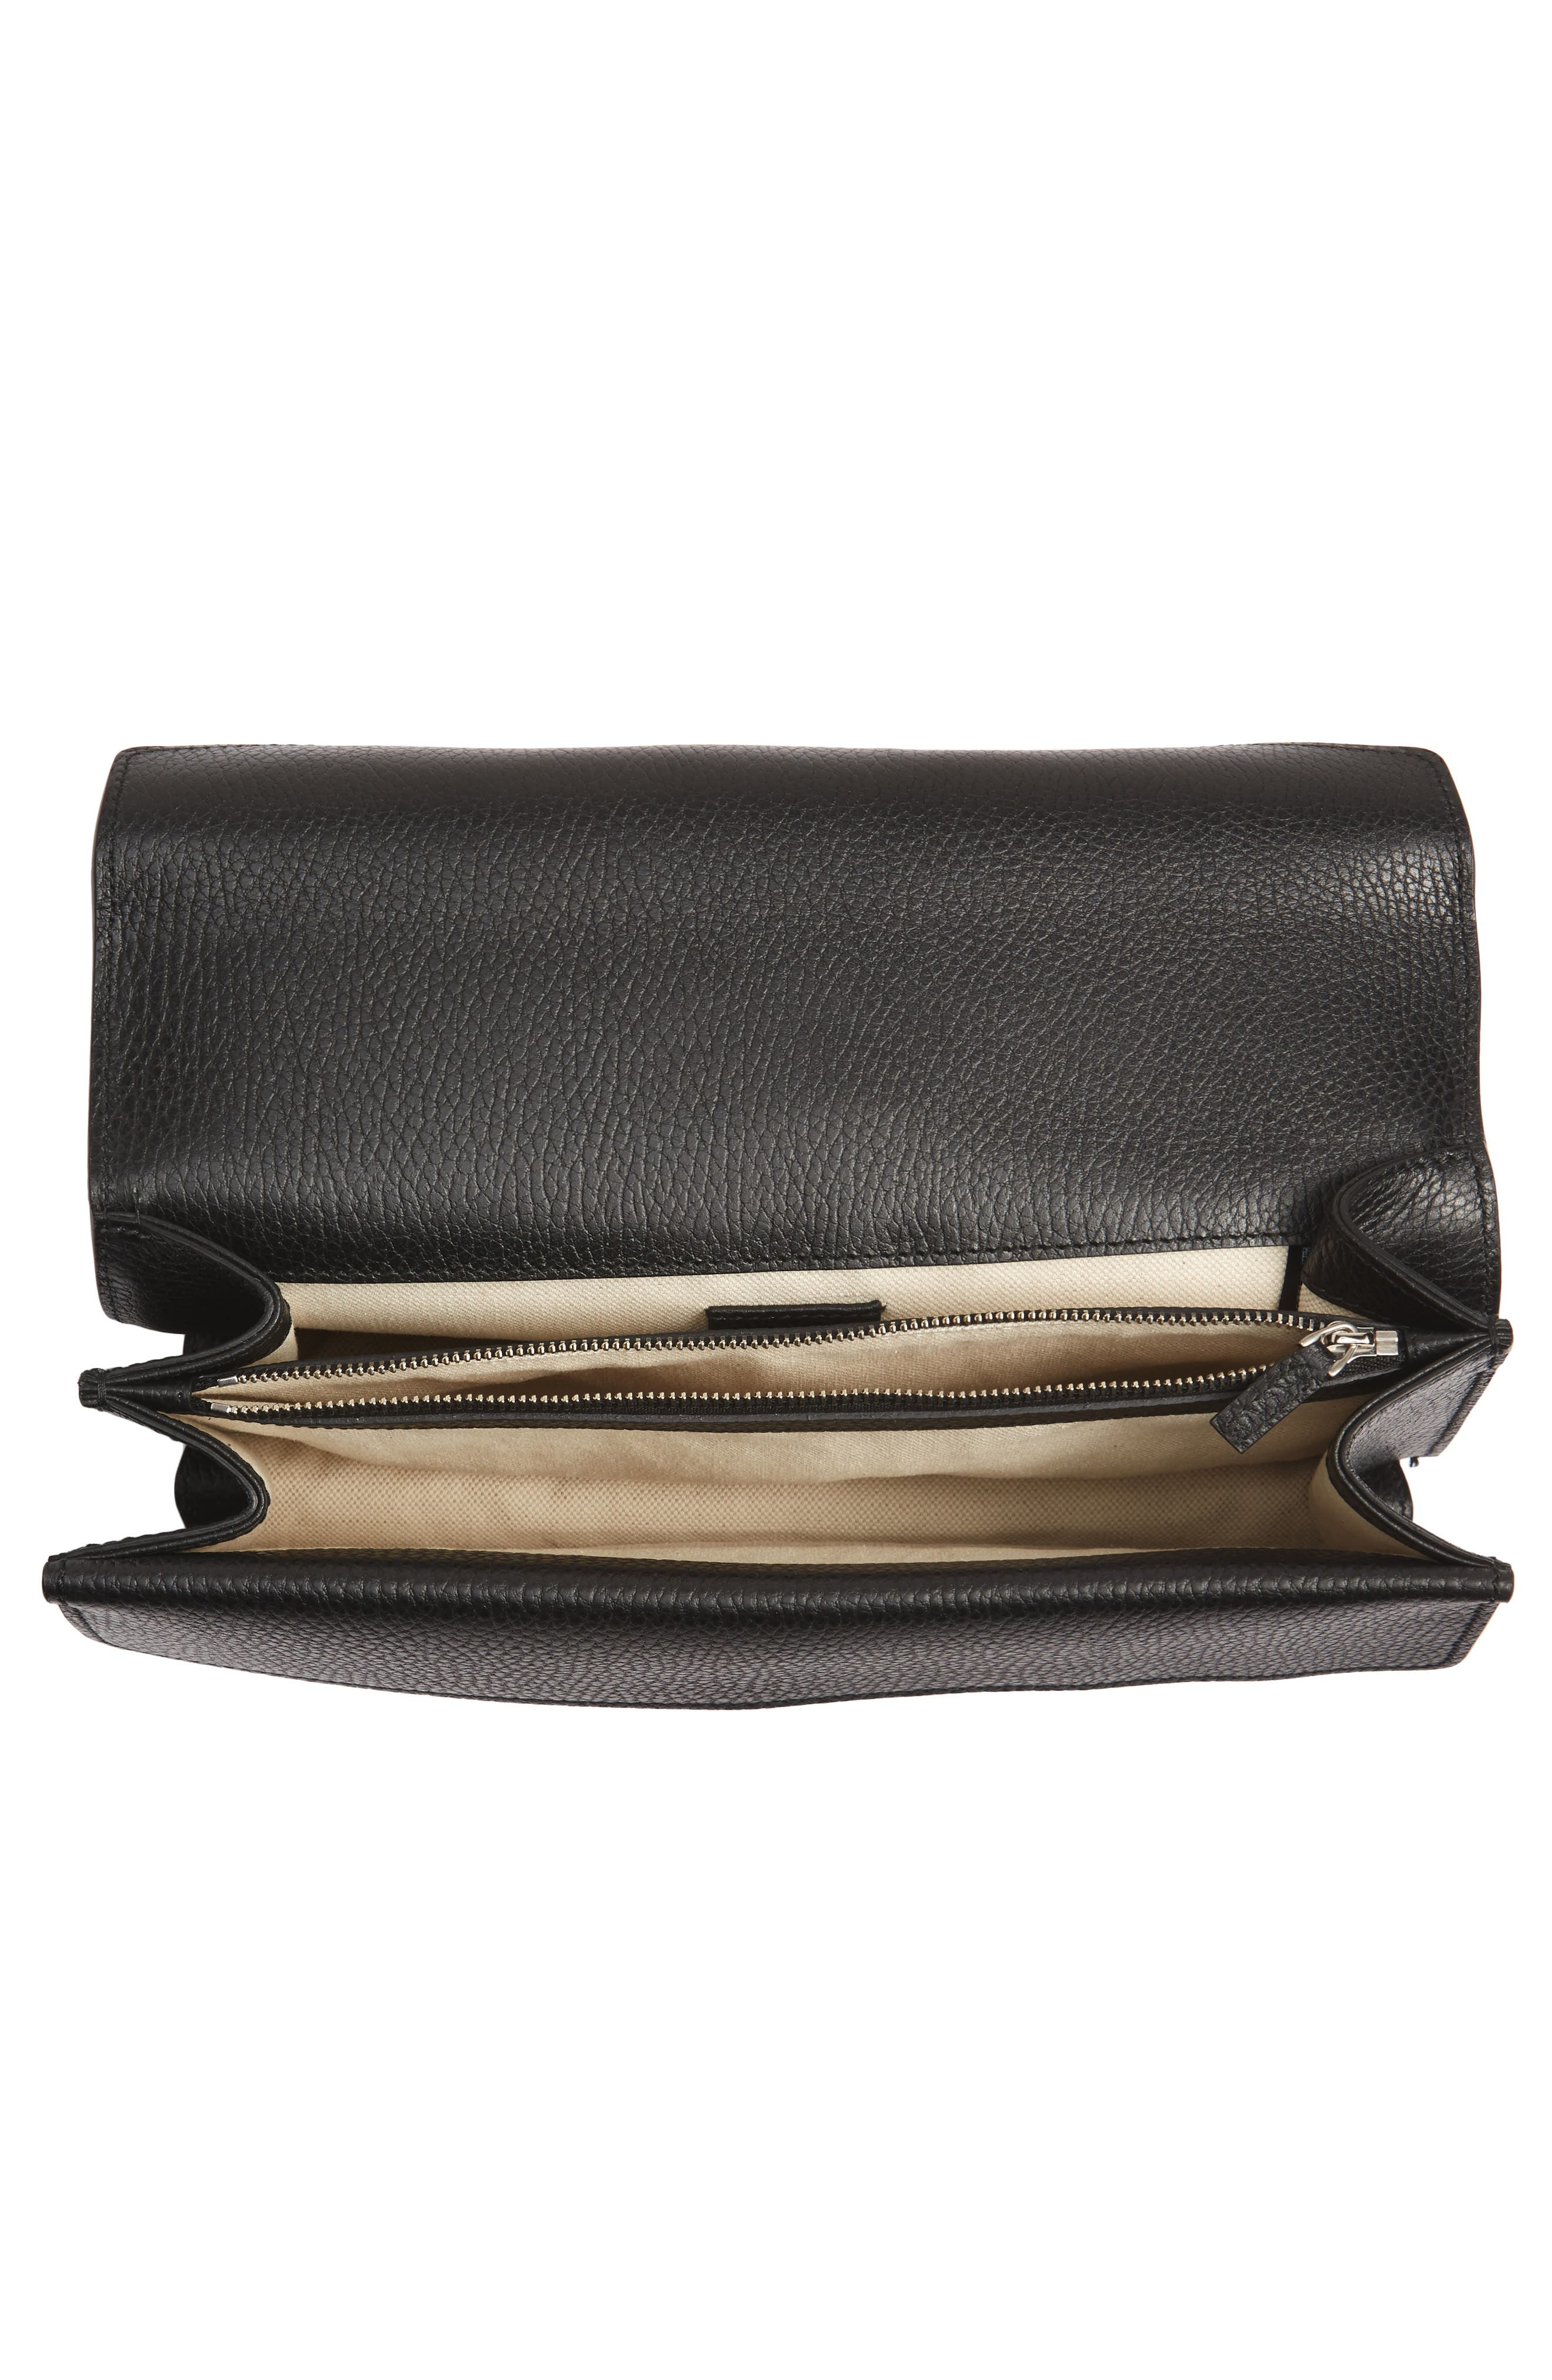 Small Dionysus Leather Shoulder Bag,                             Alternate thumbnail 4, color,                             8176 NERO/BLACK DIAMOND